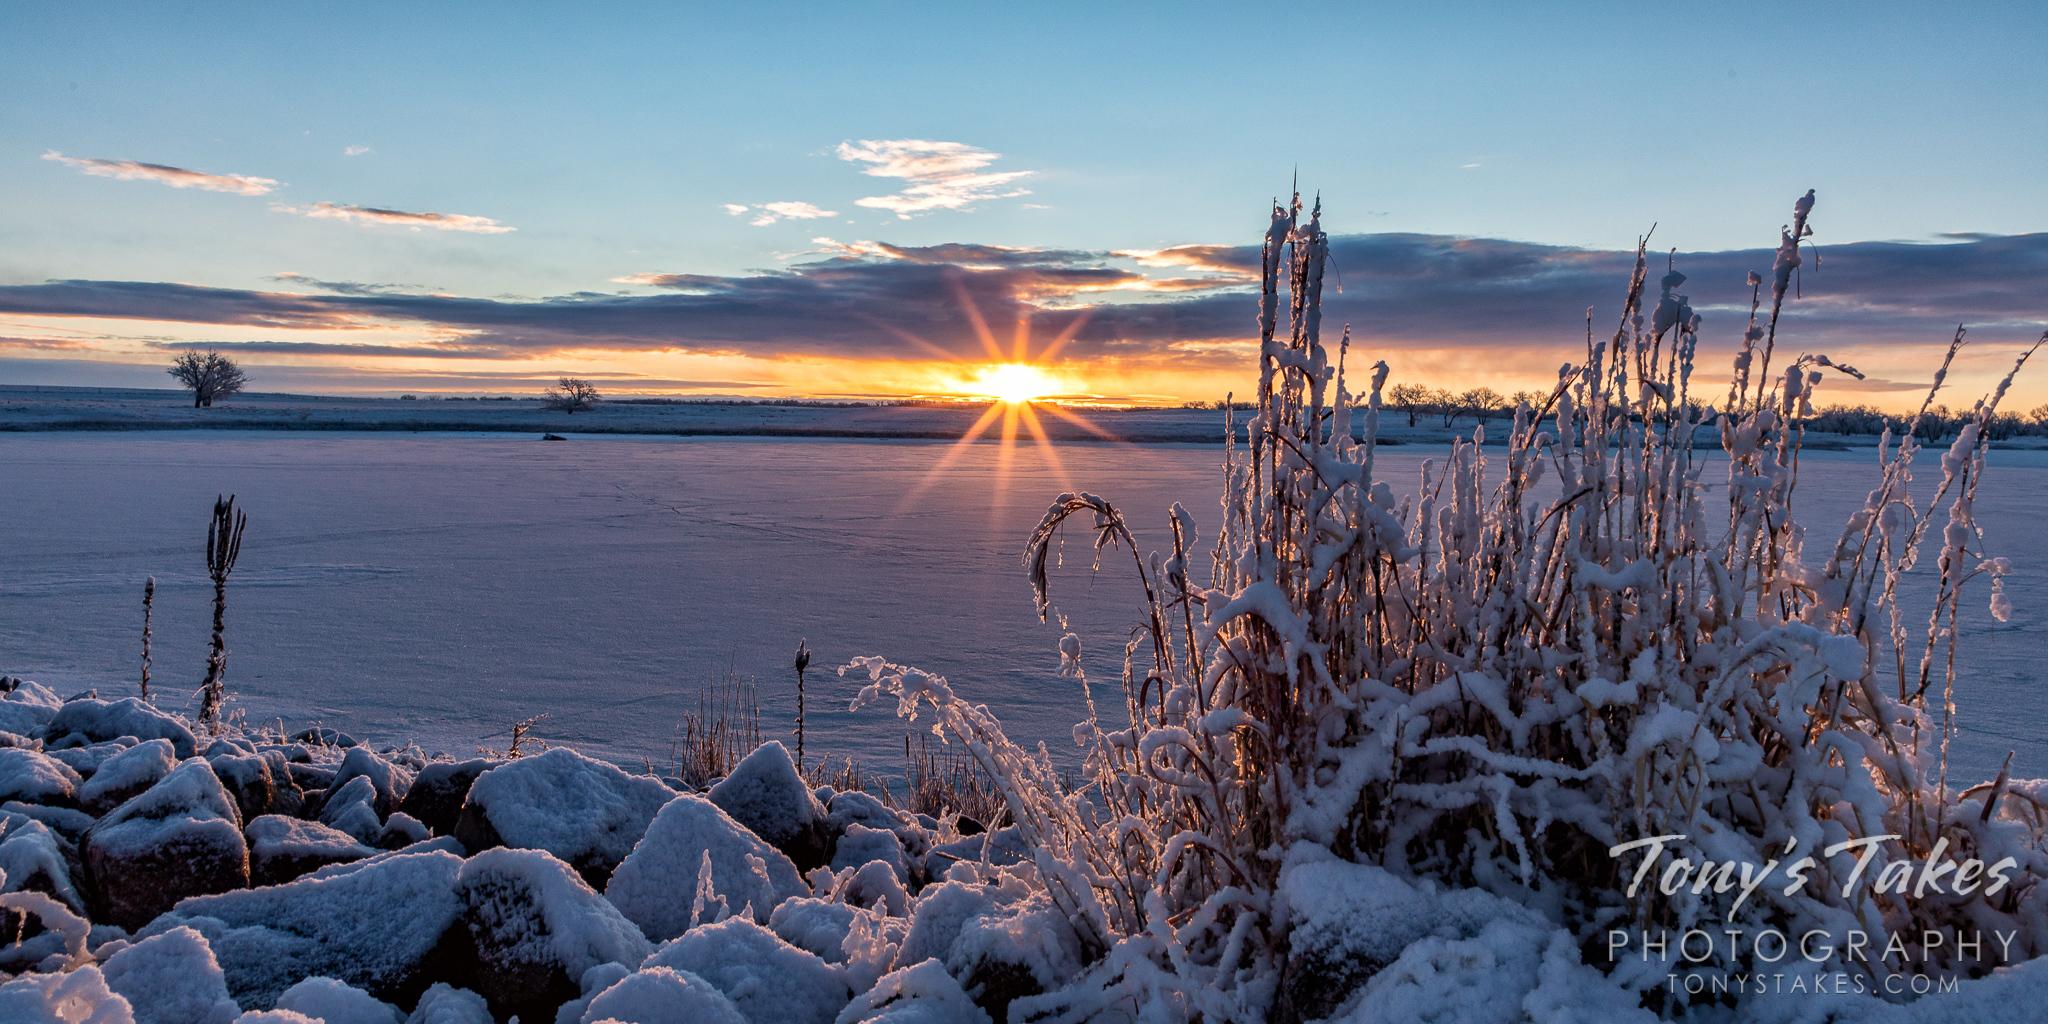 Winter's starburst across a frozen pond